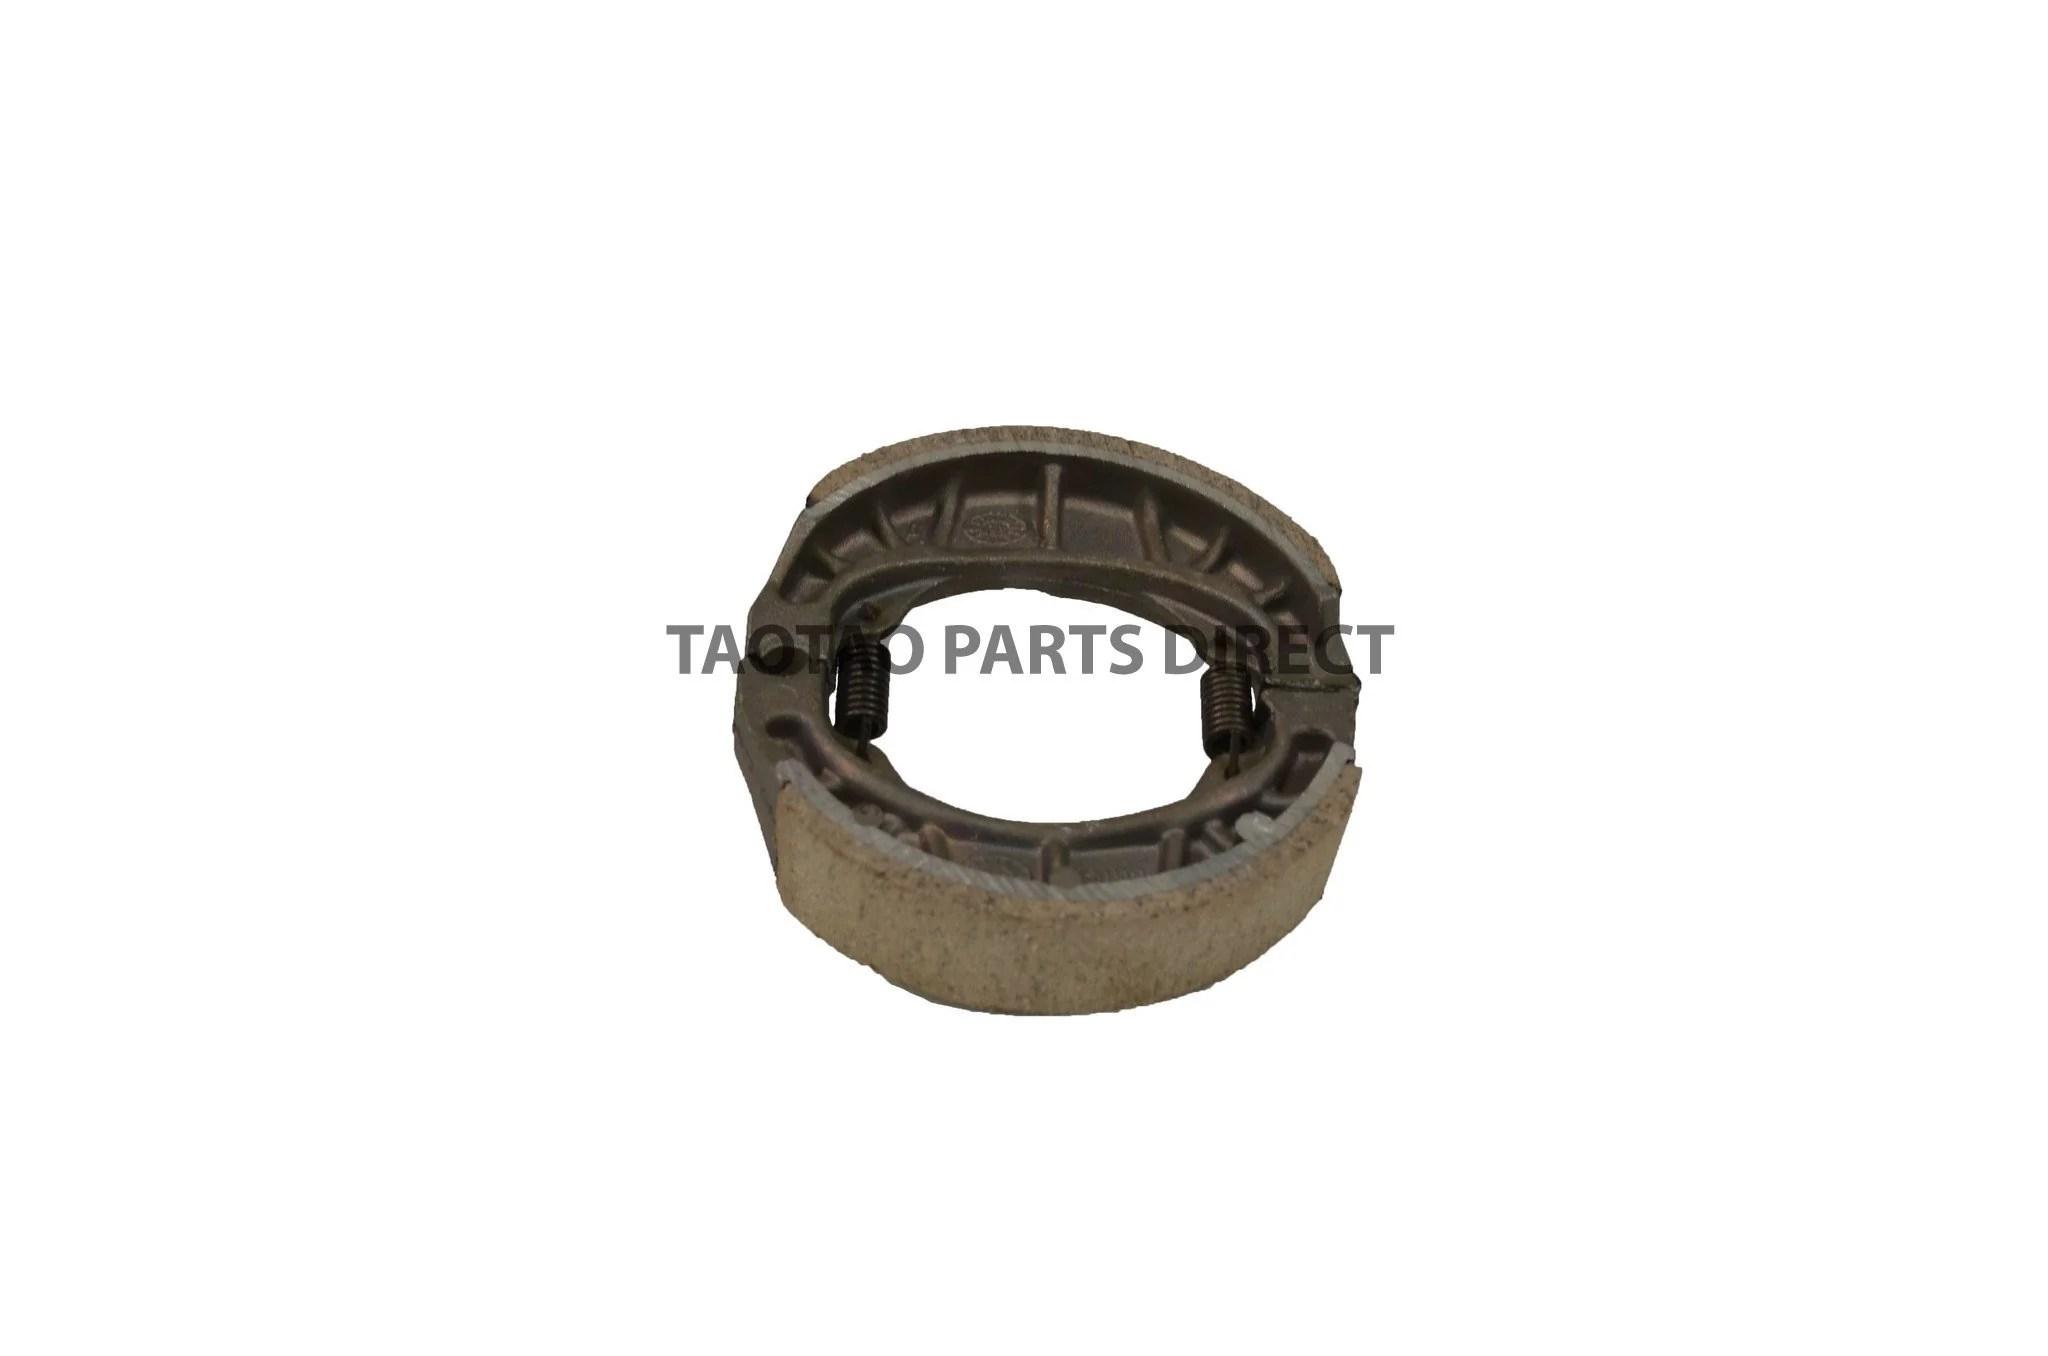 49cc brake shoes taotaopartsdirect com [ 2048 x 1356 Pixel ]